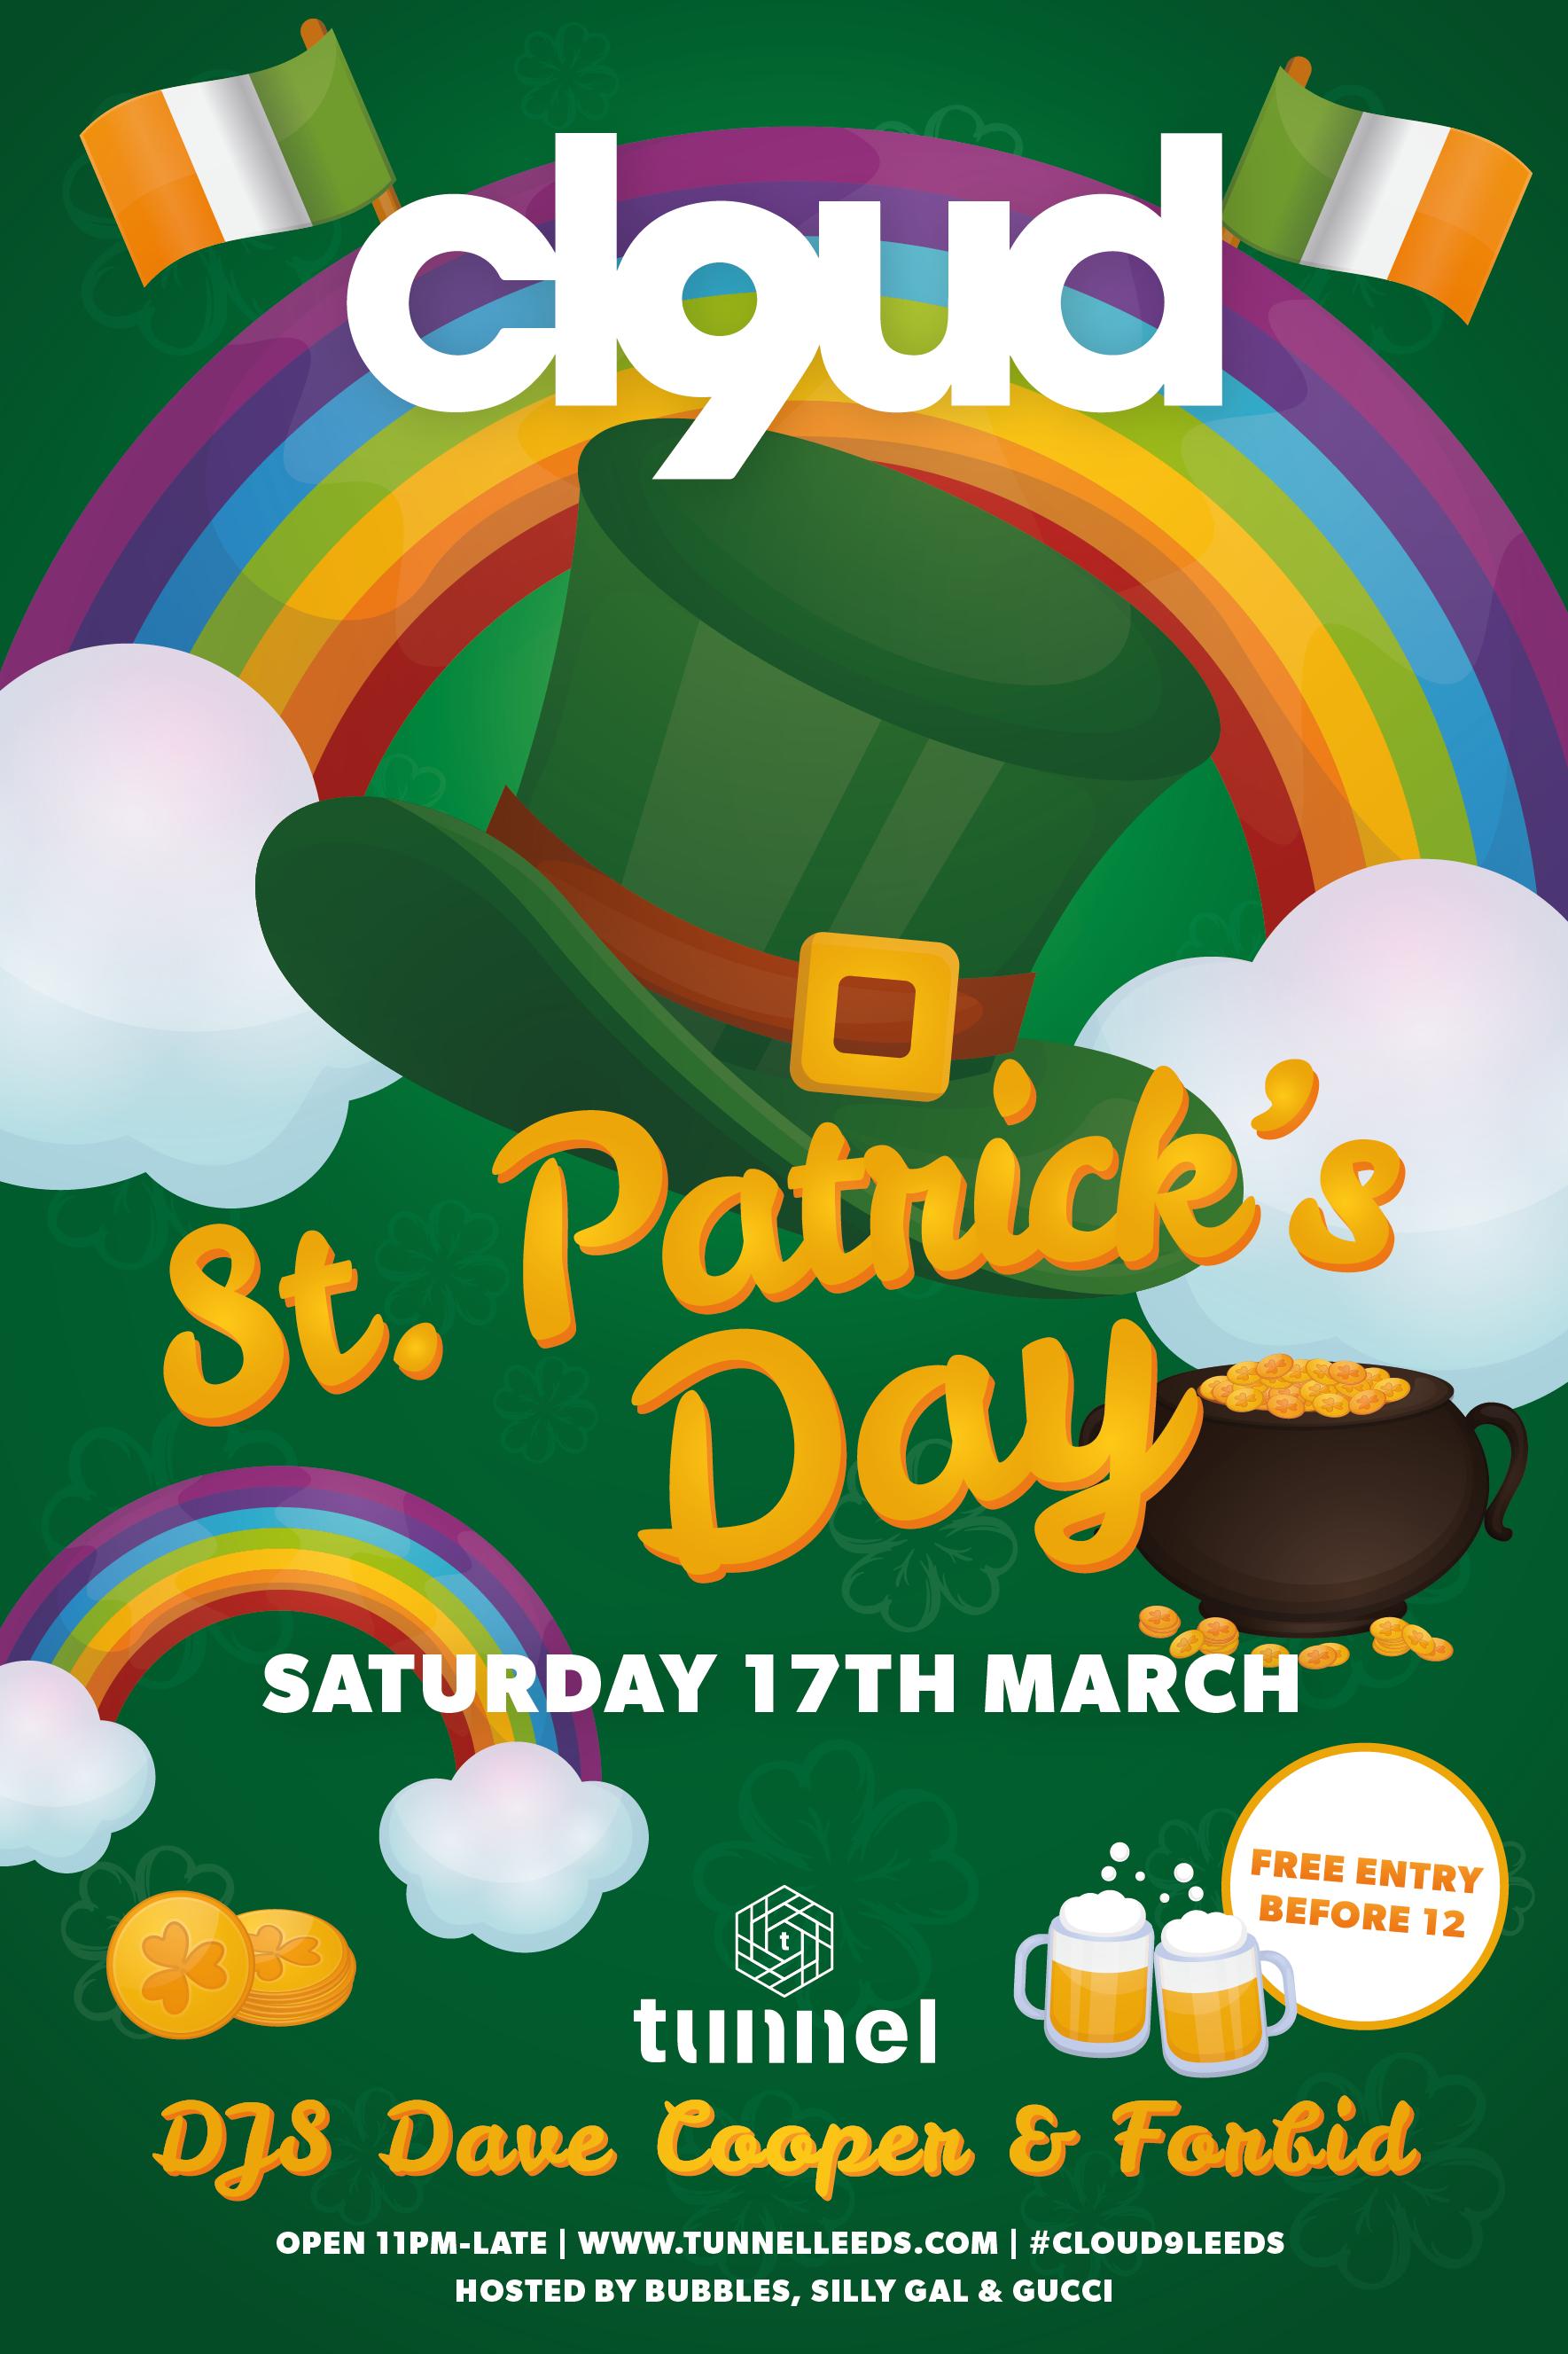 Cloud9 St Patricks Day 2018.png